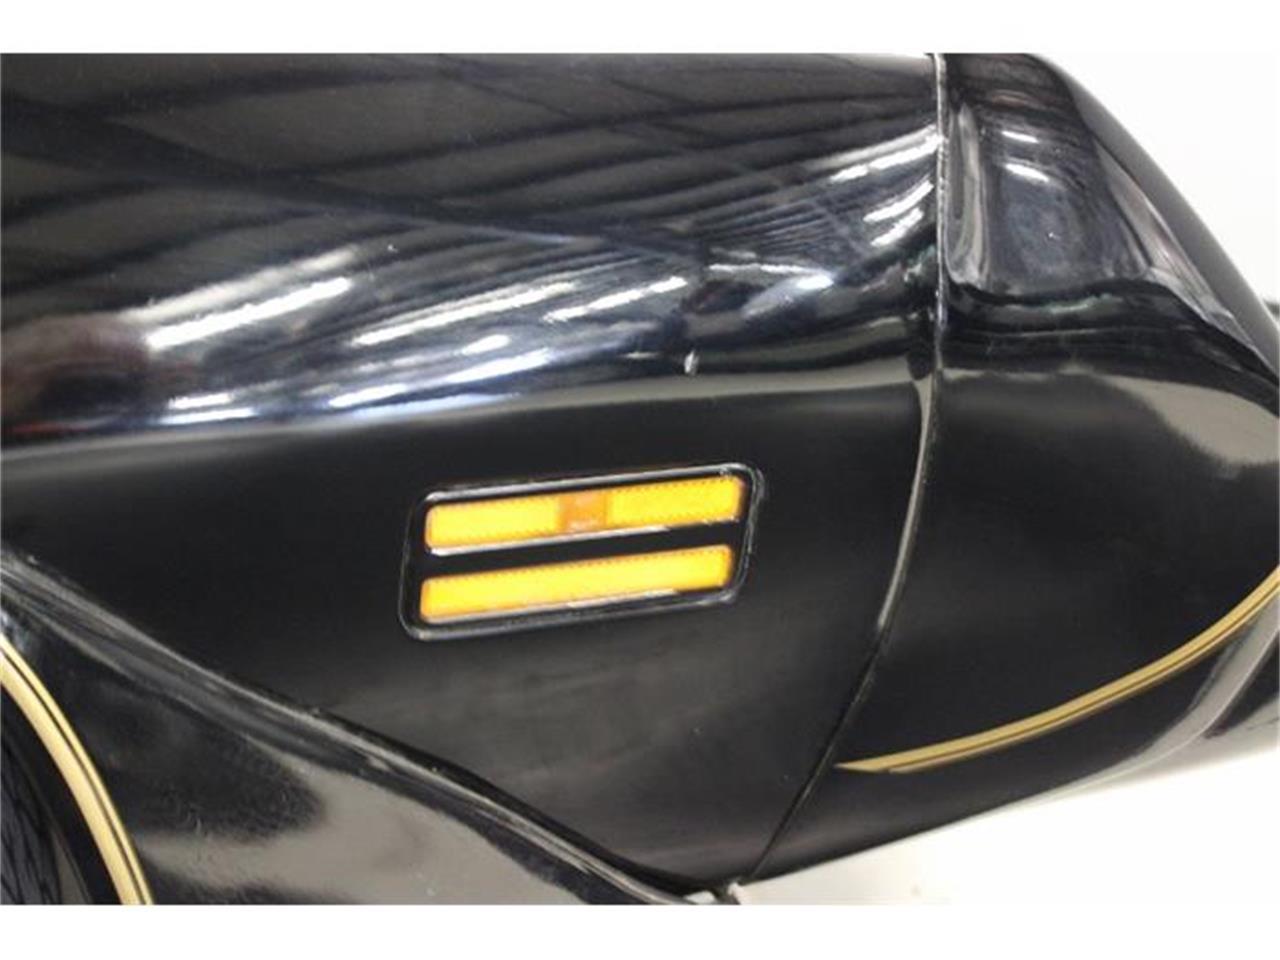 Large Picture of '79 Pontiac Firebird Trans Am located in Lillington North Carolina - $22,000.00 - IYHT